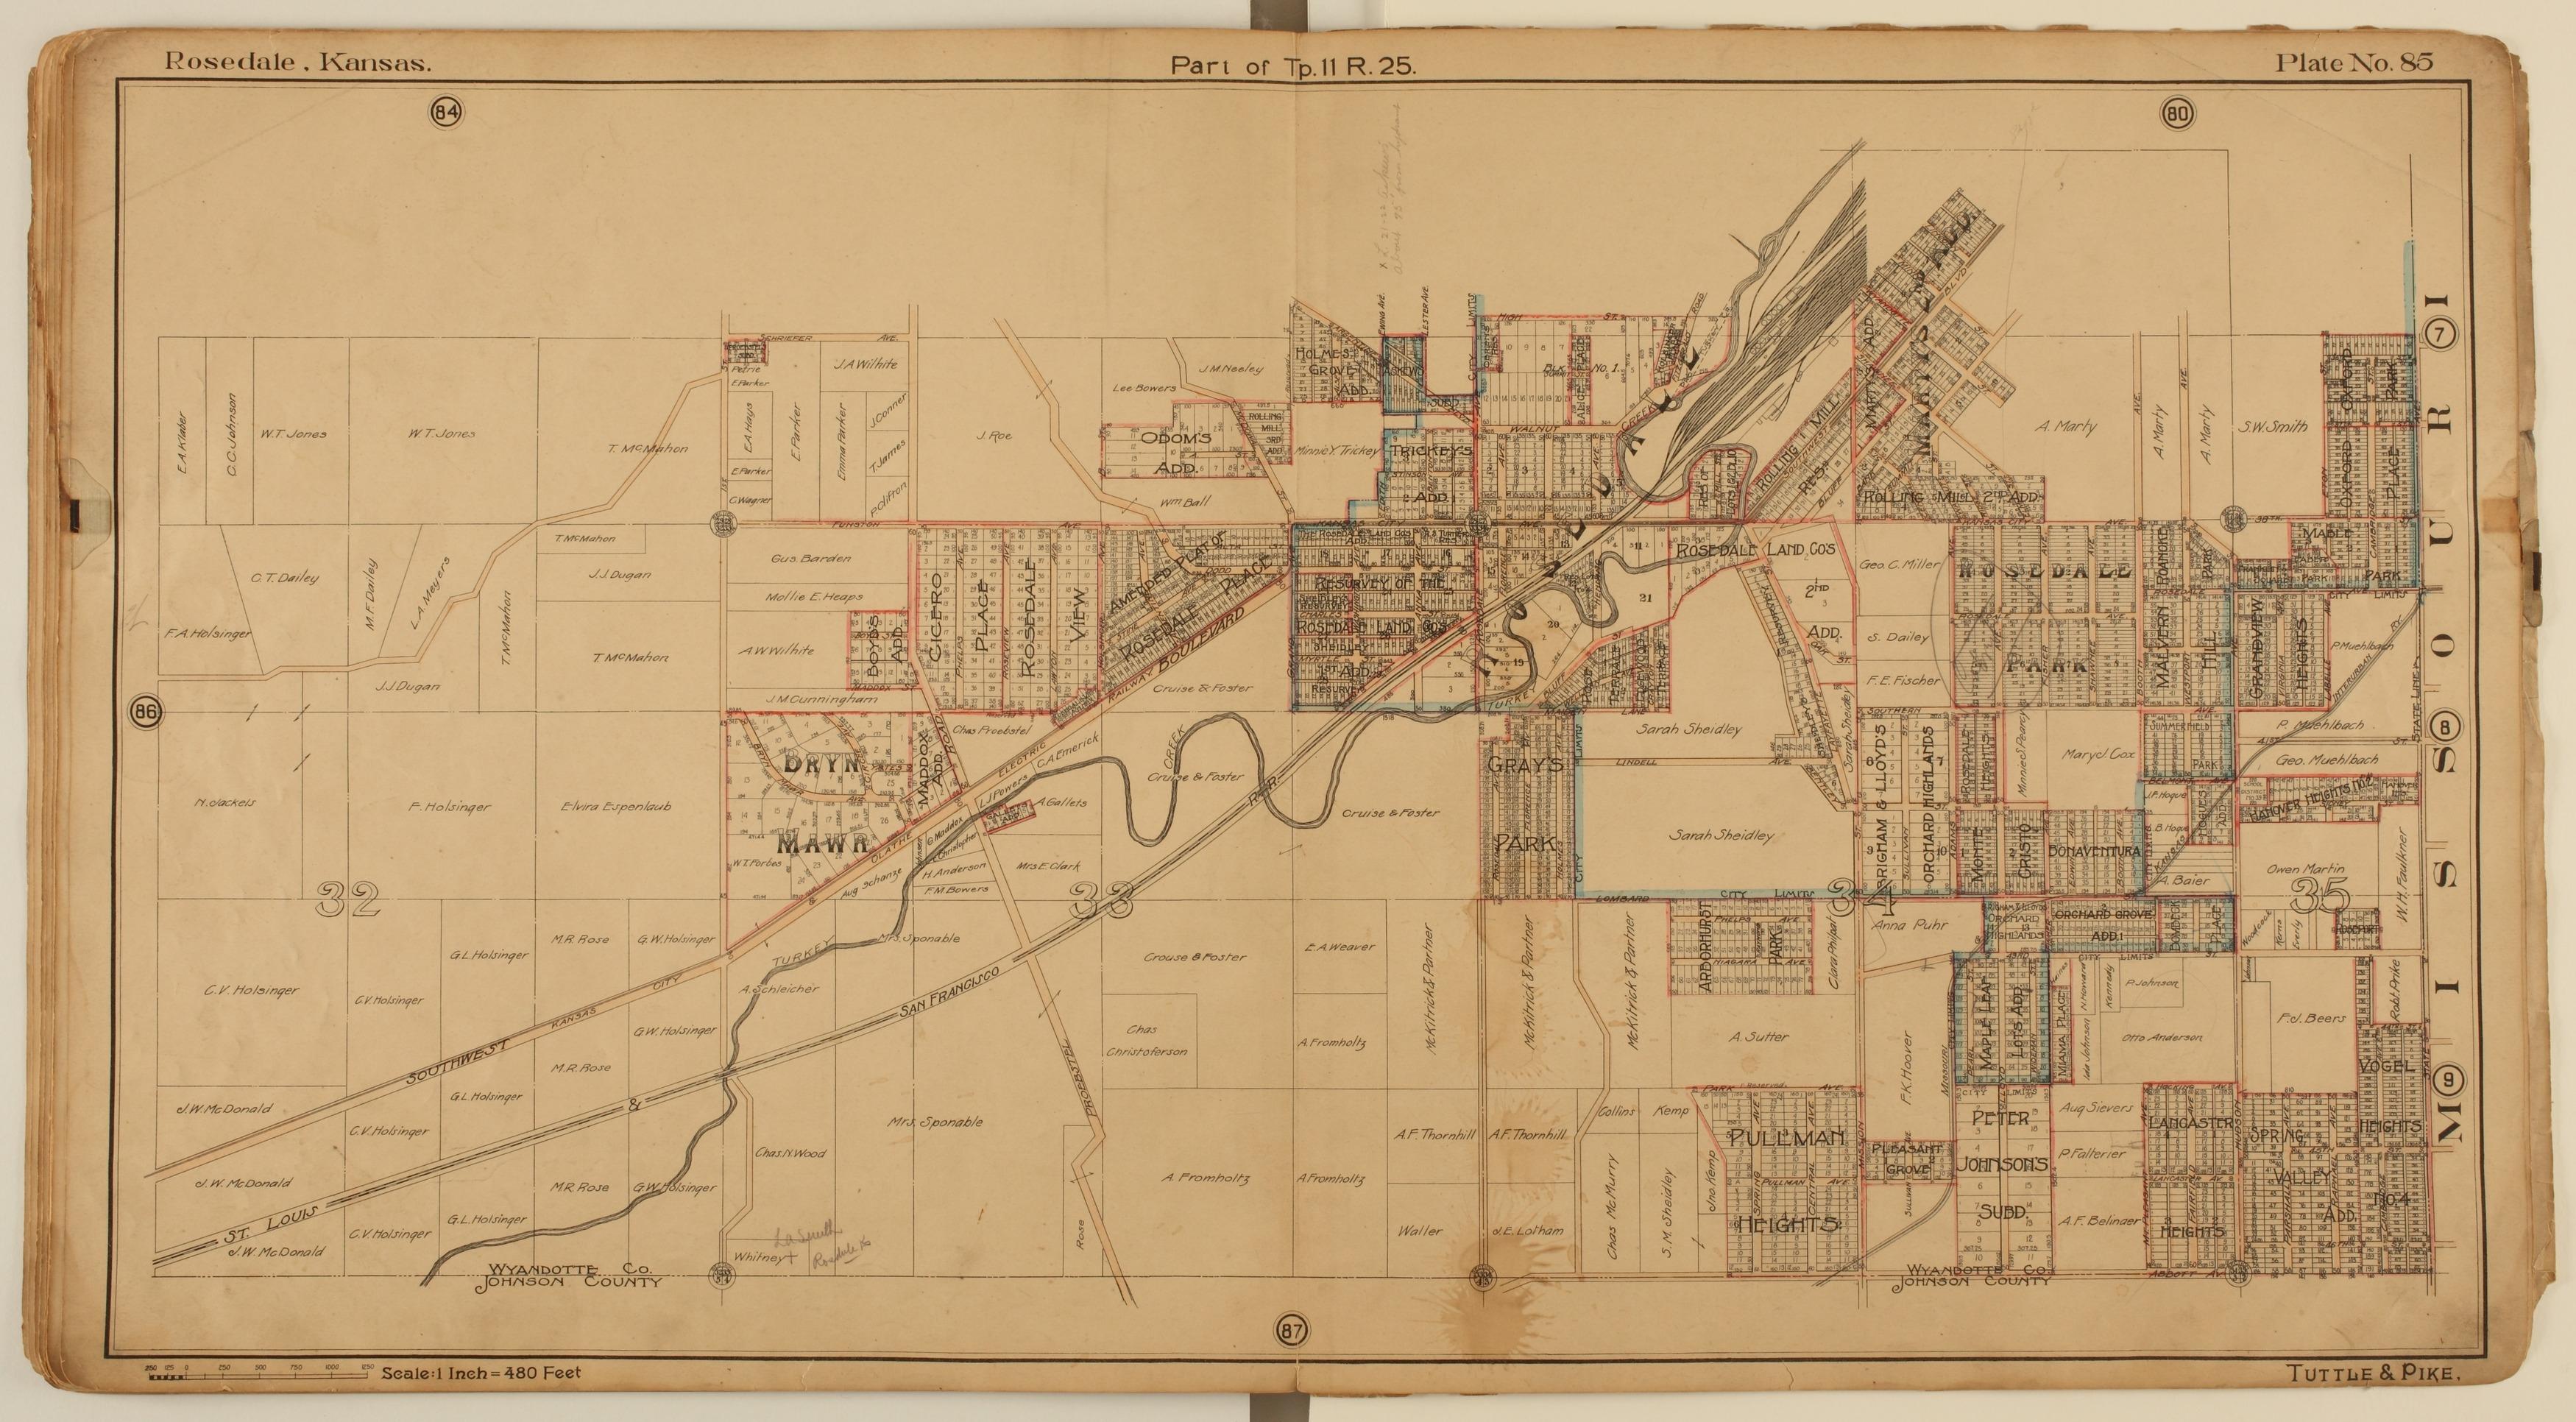 Tuttle and Pike's atlas of Kansas City, Kansas - 11